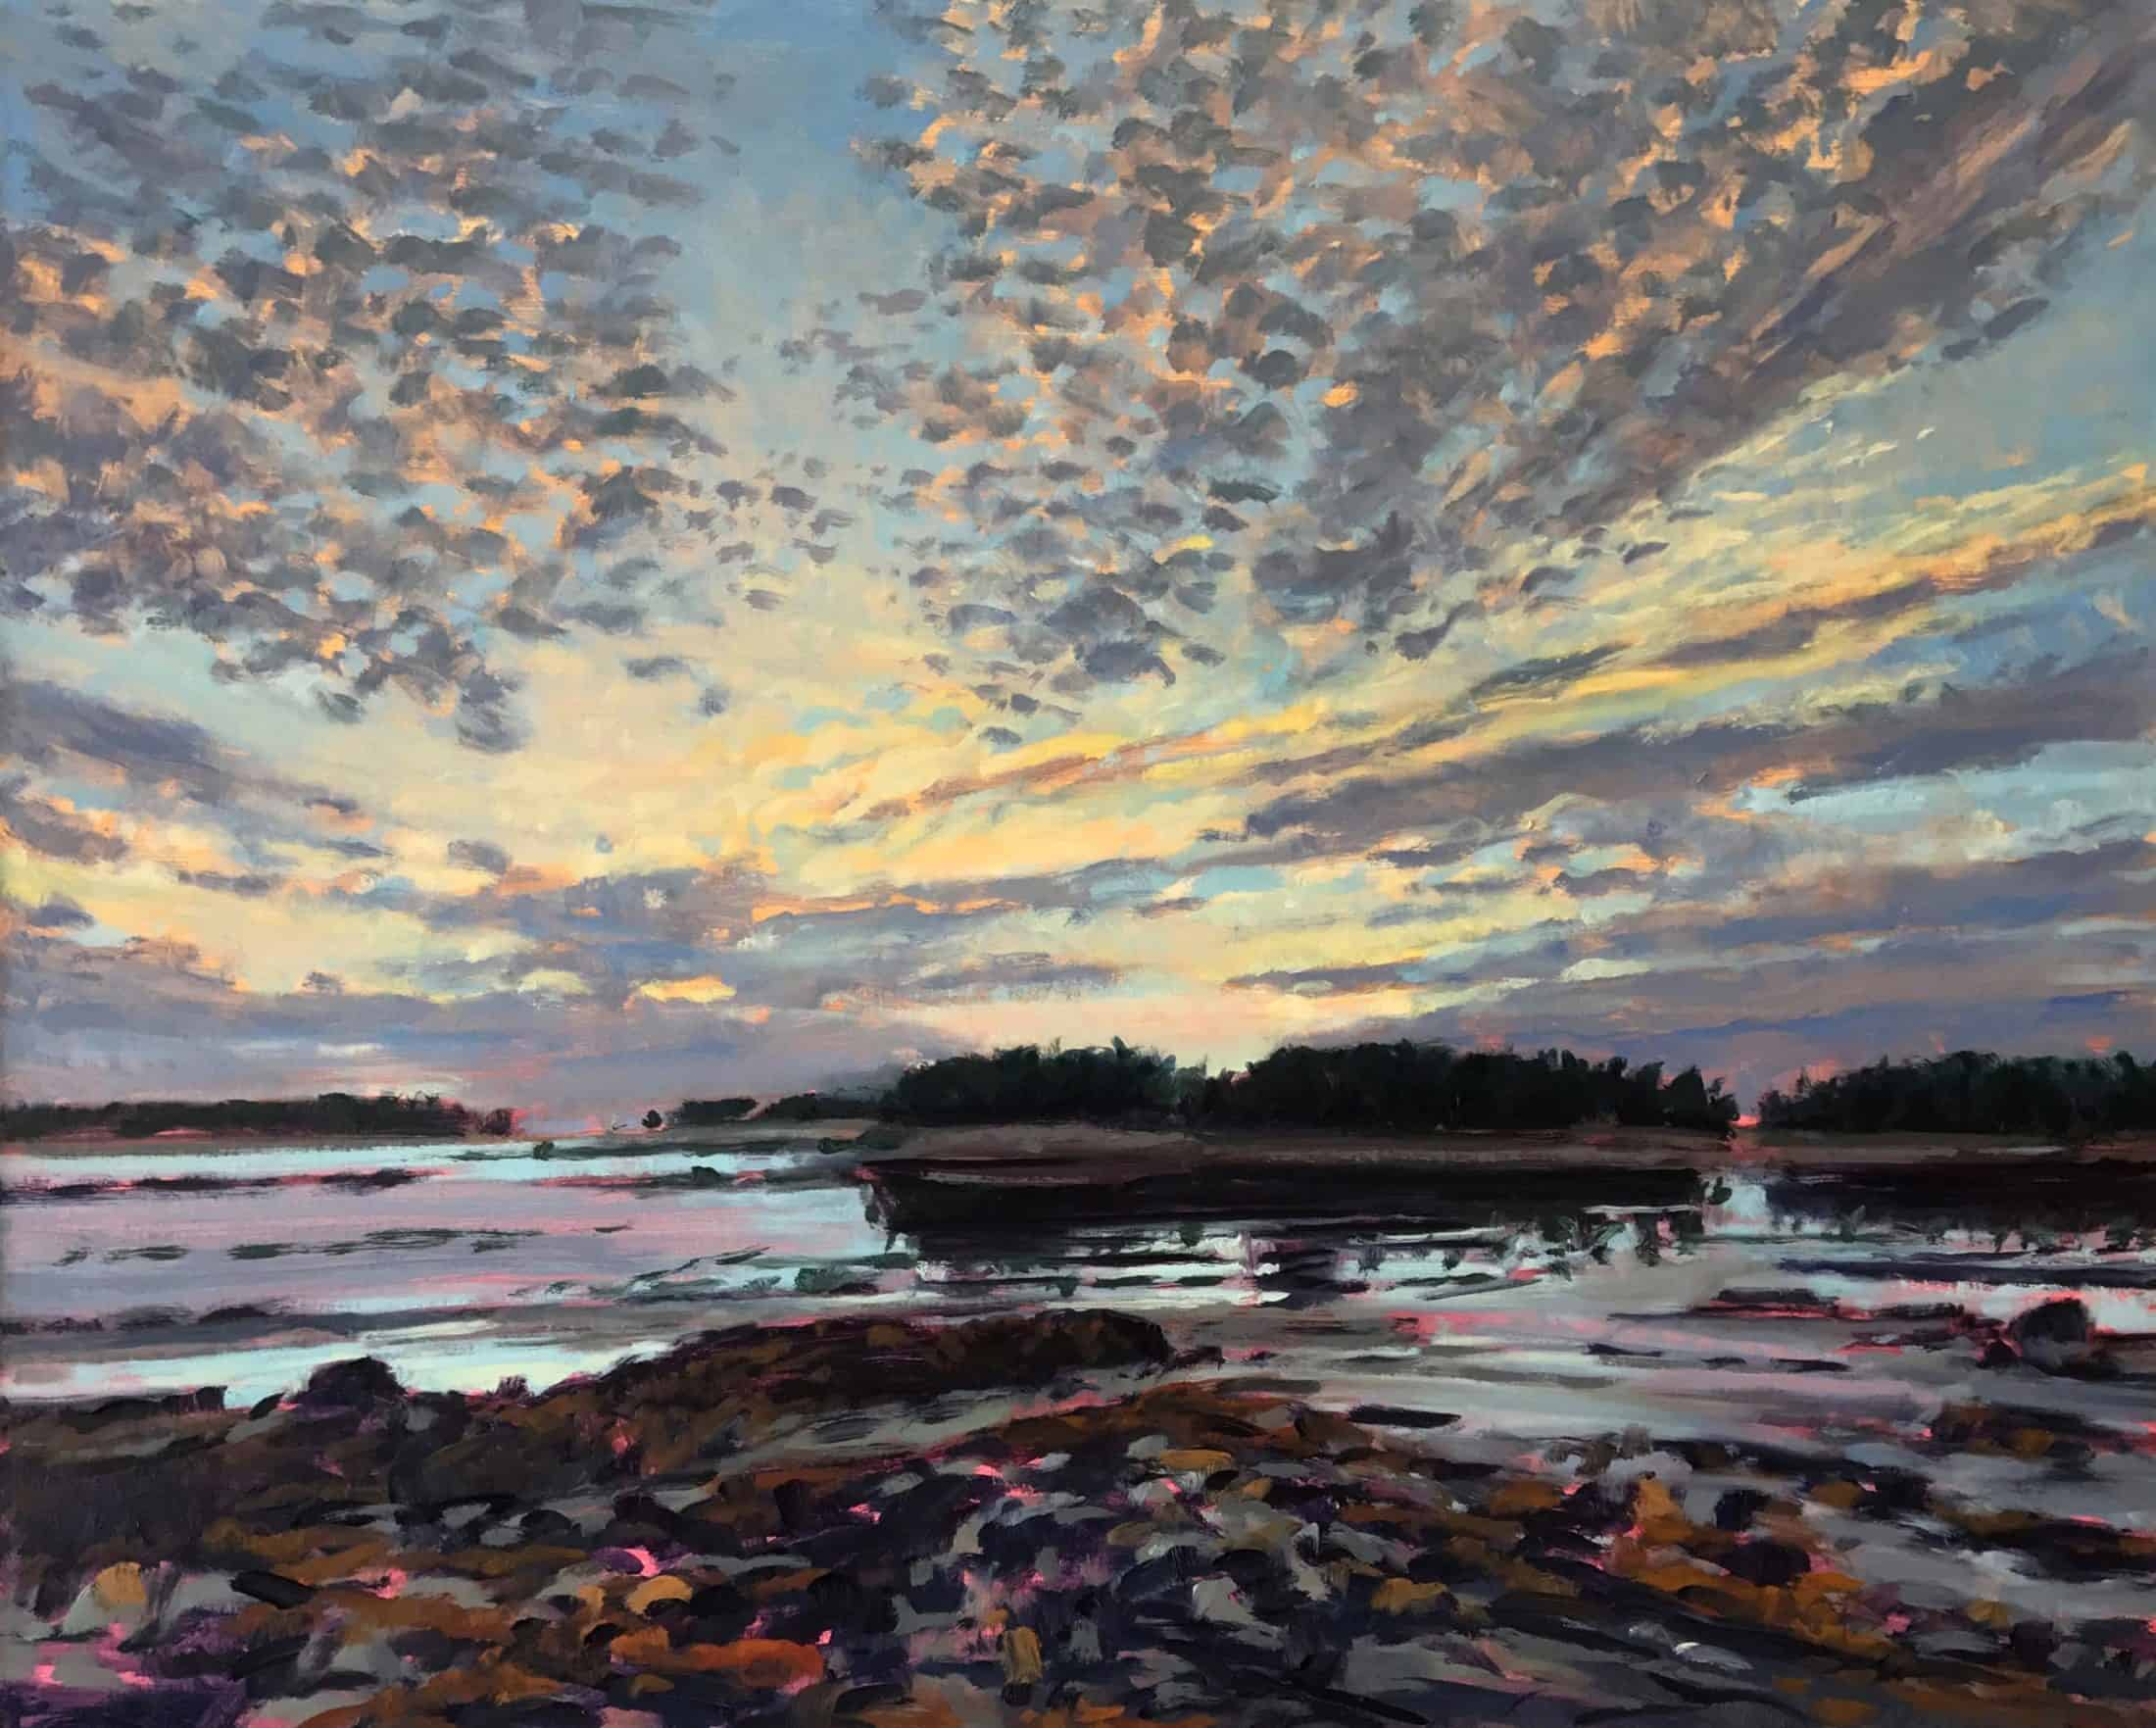 Nina Jerome, Twilight Across the Pool, 2016, oil on linen, 24 x 30 inches